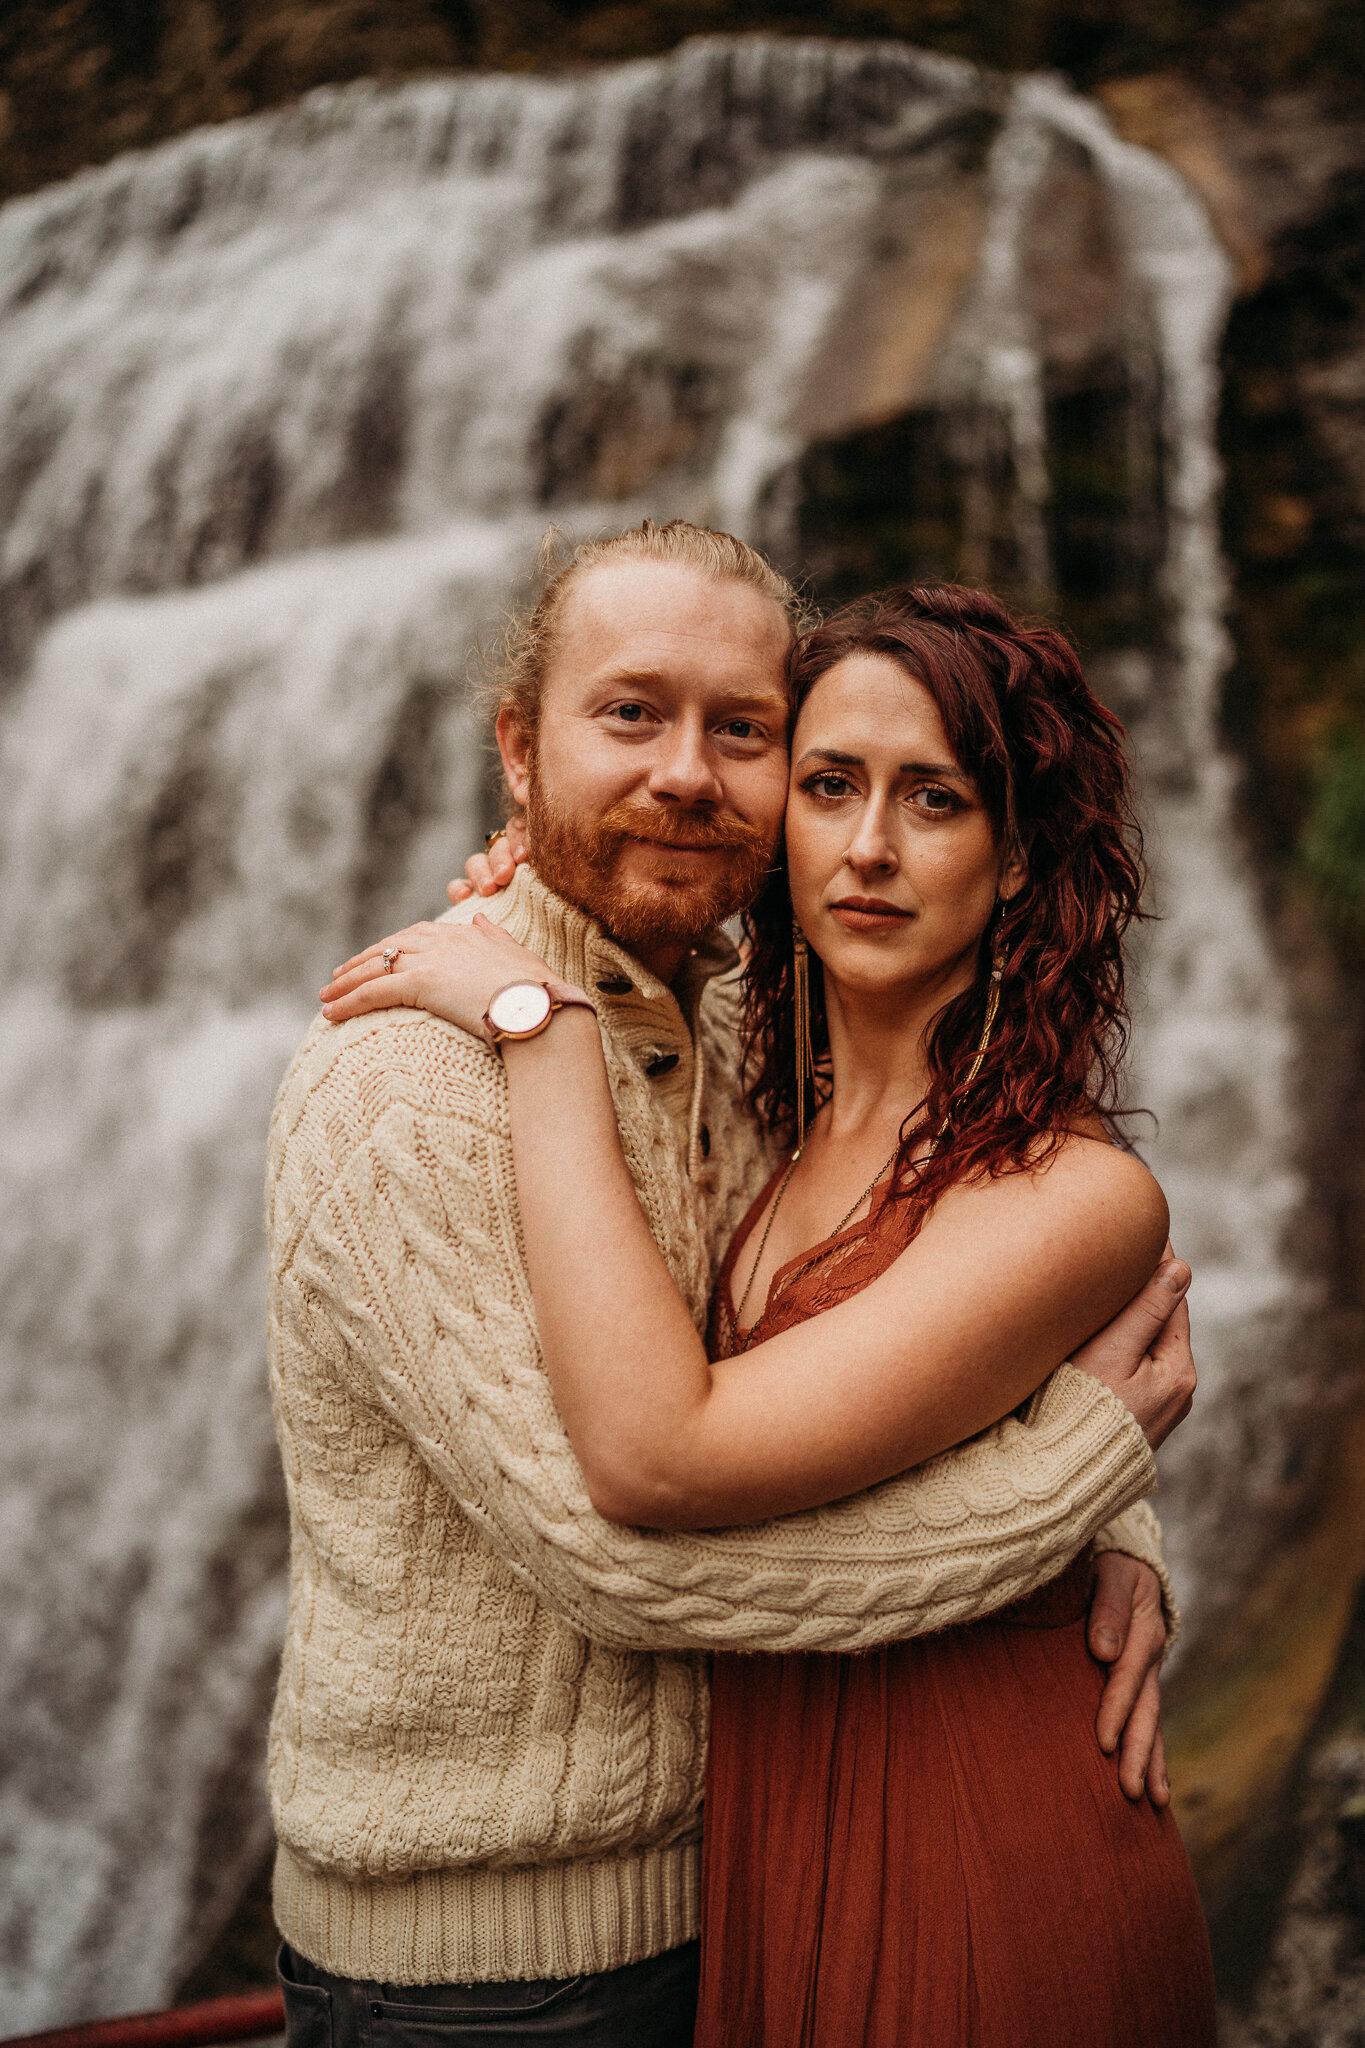 Susan And Kirk Engagement Robert Treman park-06606.jpg